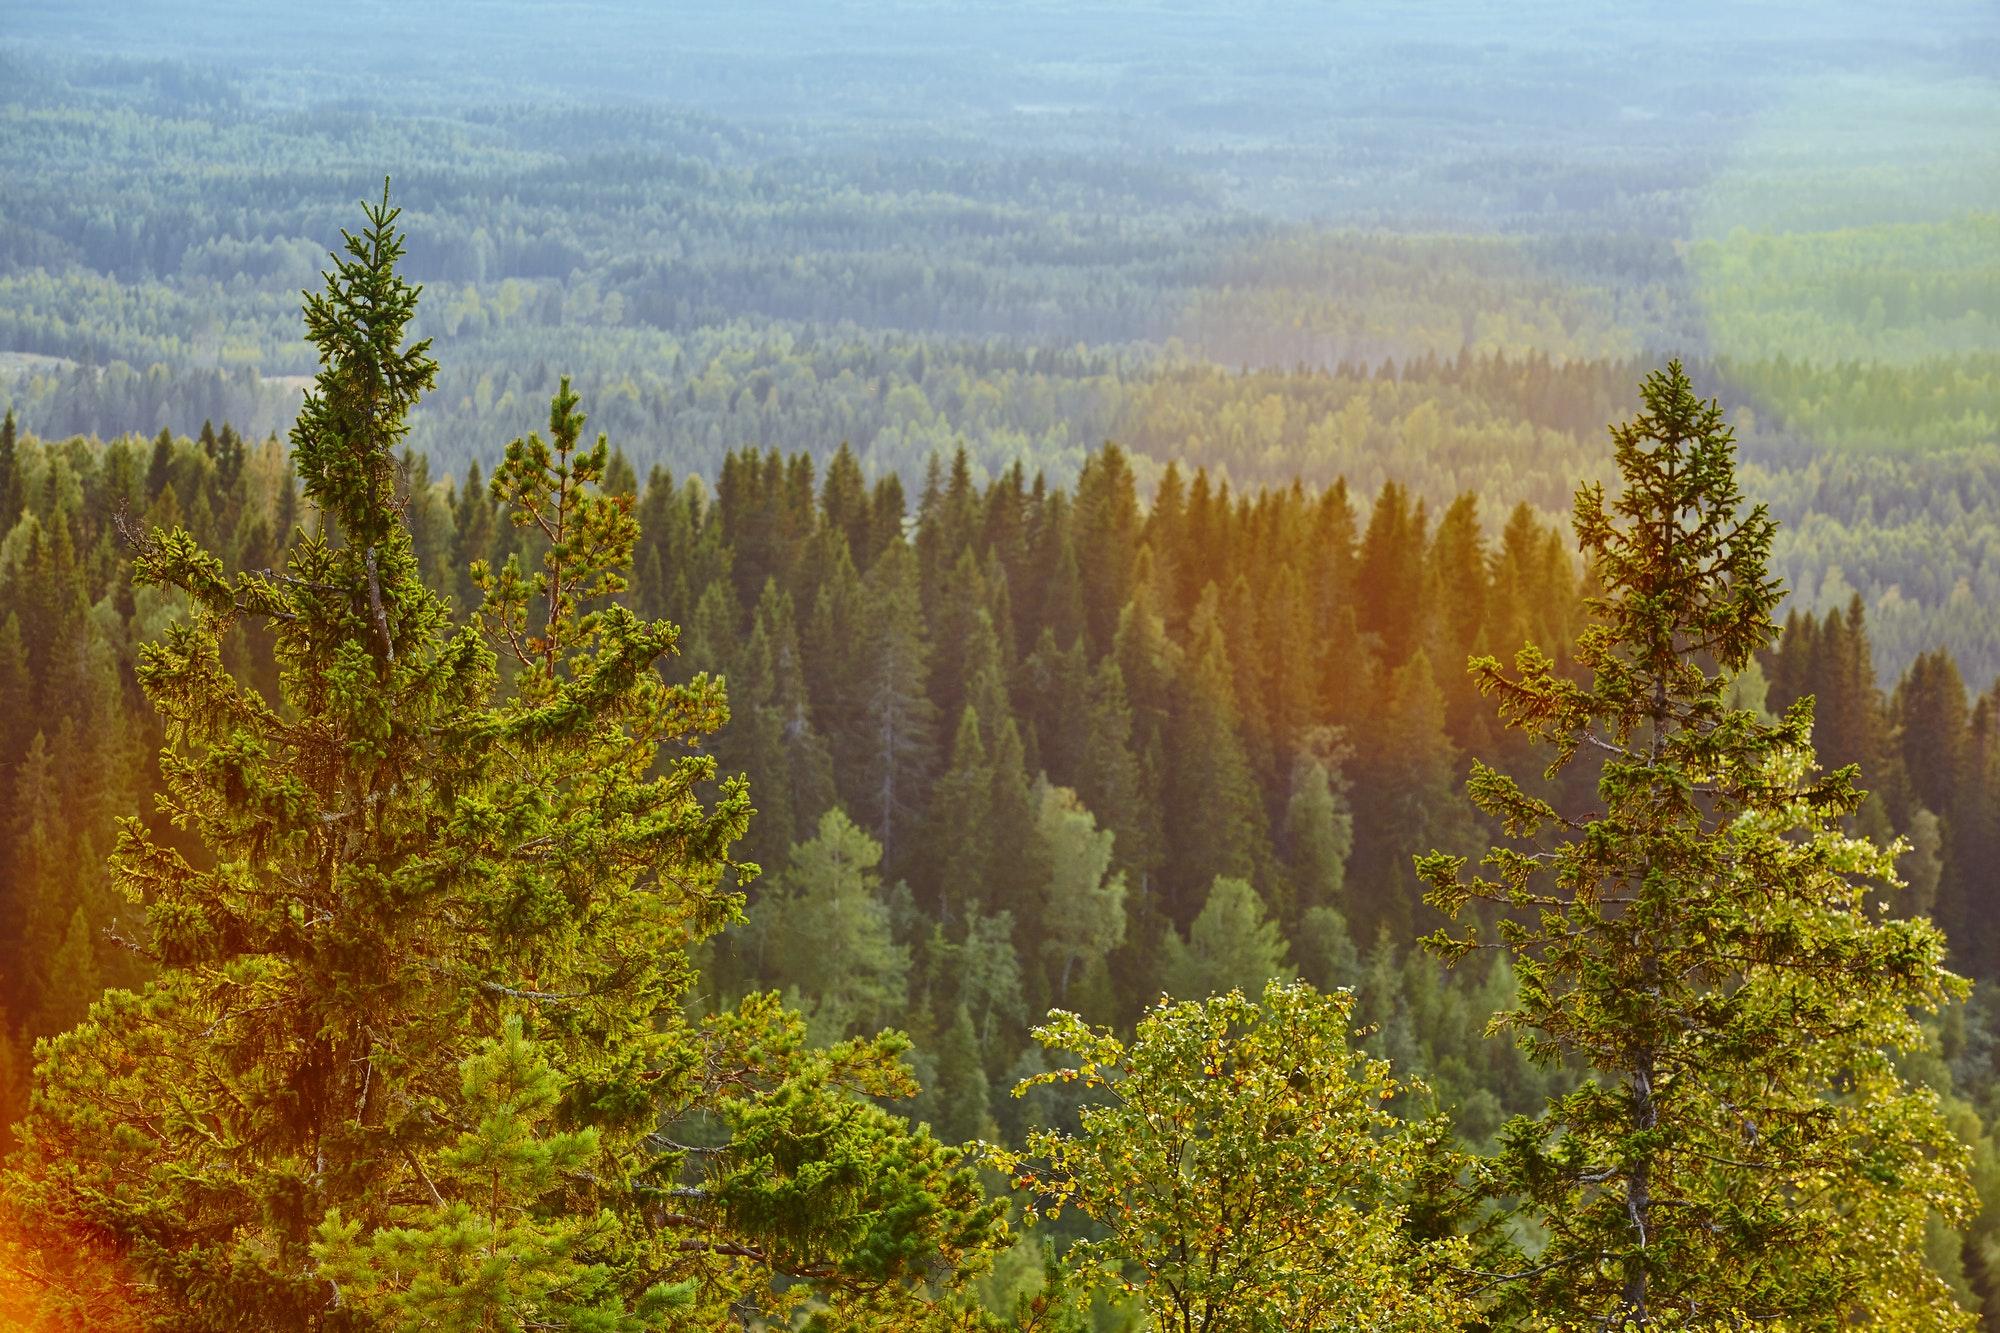 Finland forest at sunset. Koli National Park. Pielinen area. Karelia